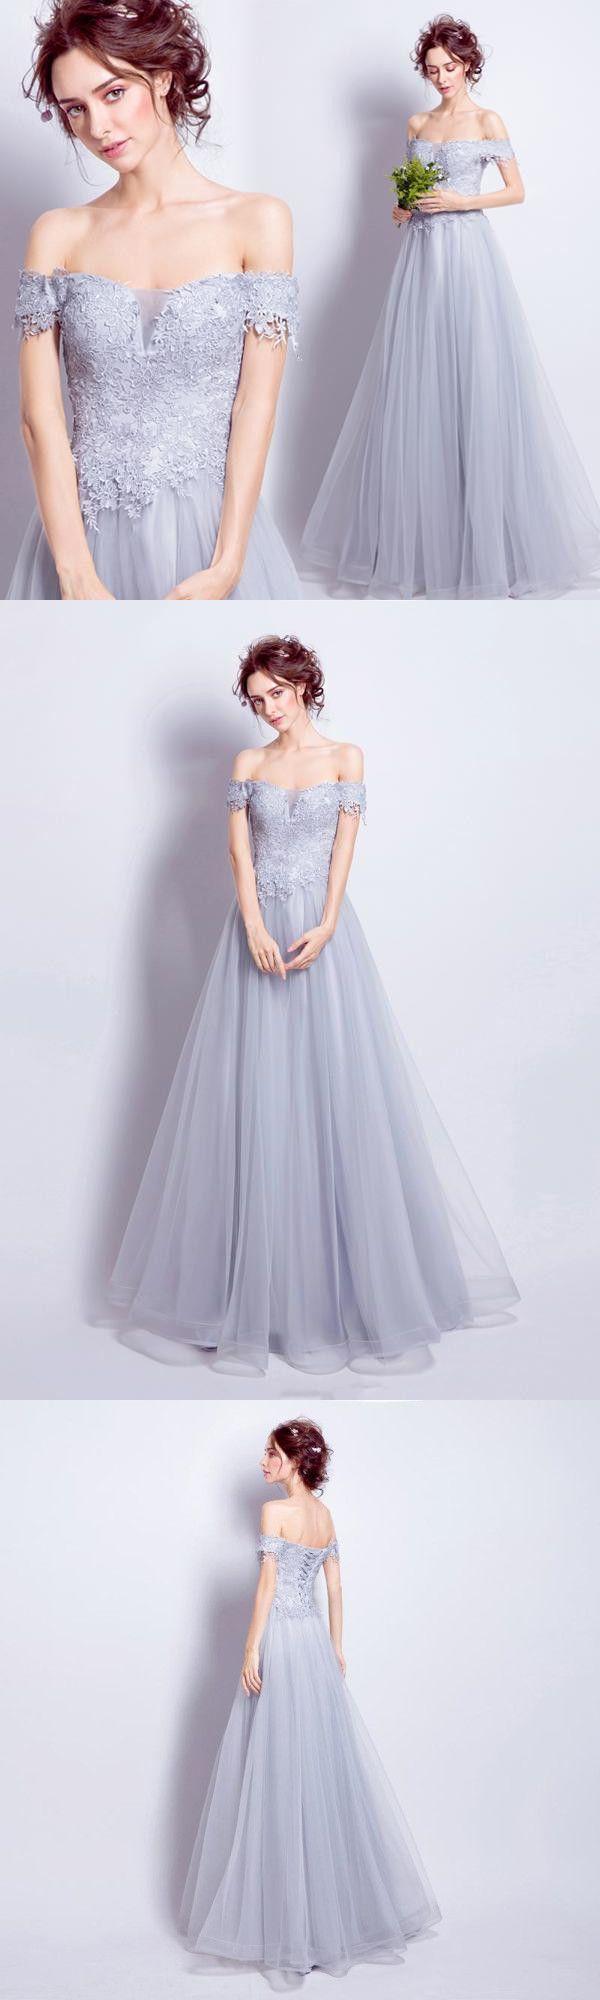 best long prom dressesortdress images on pinterest